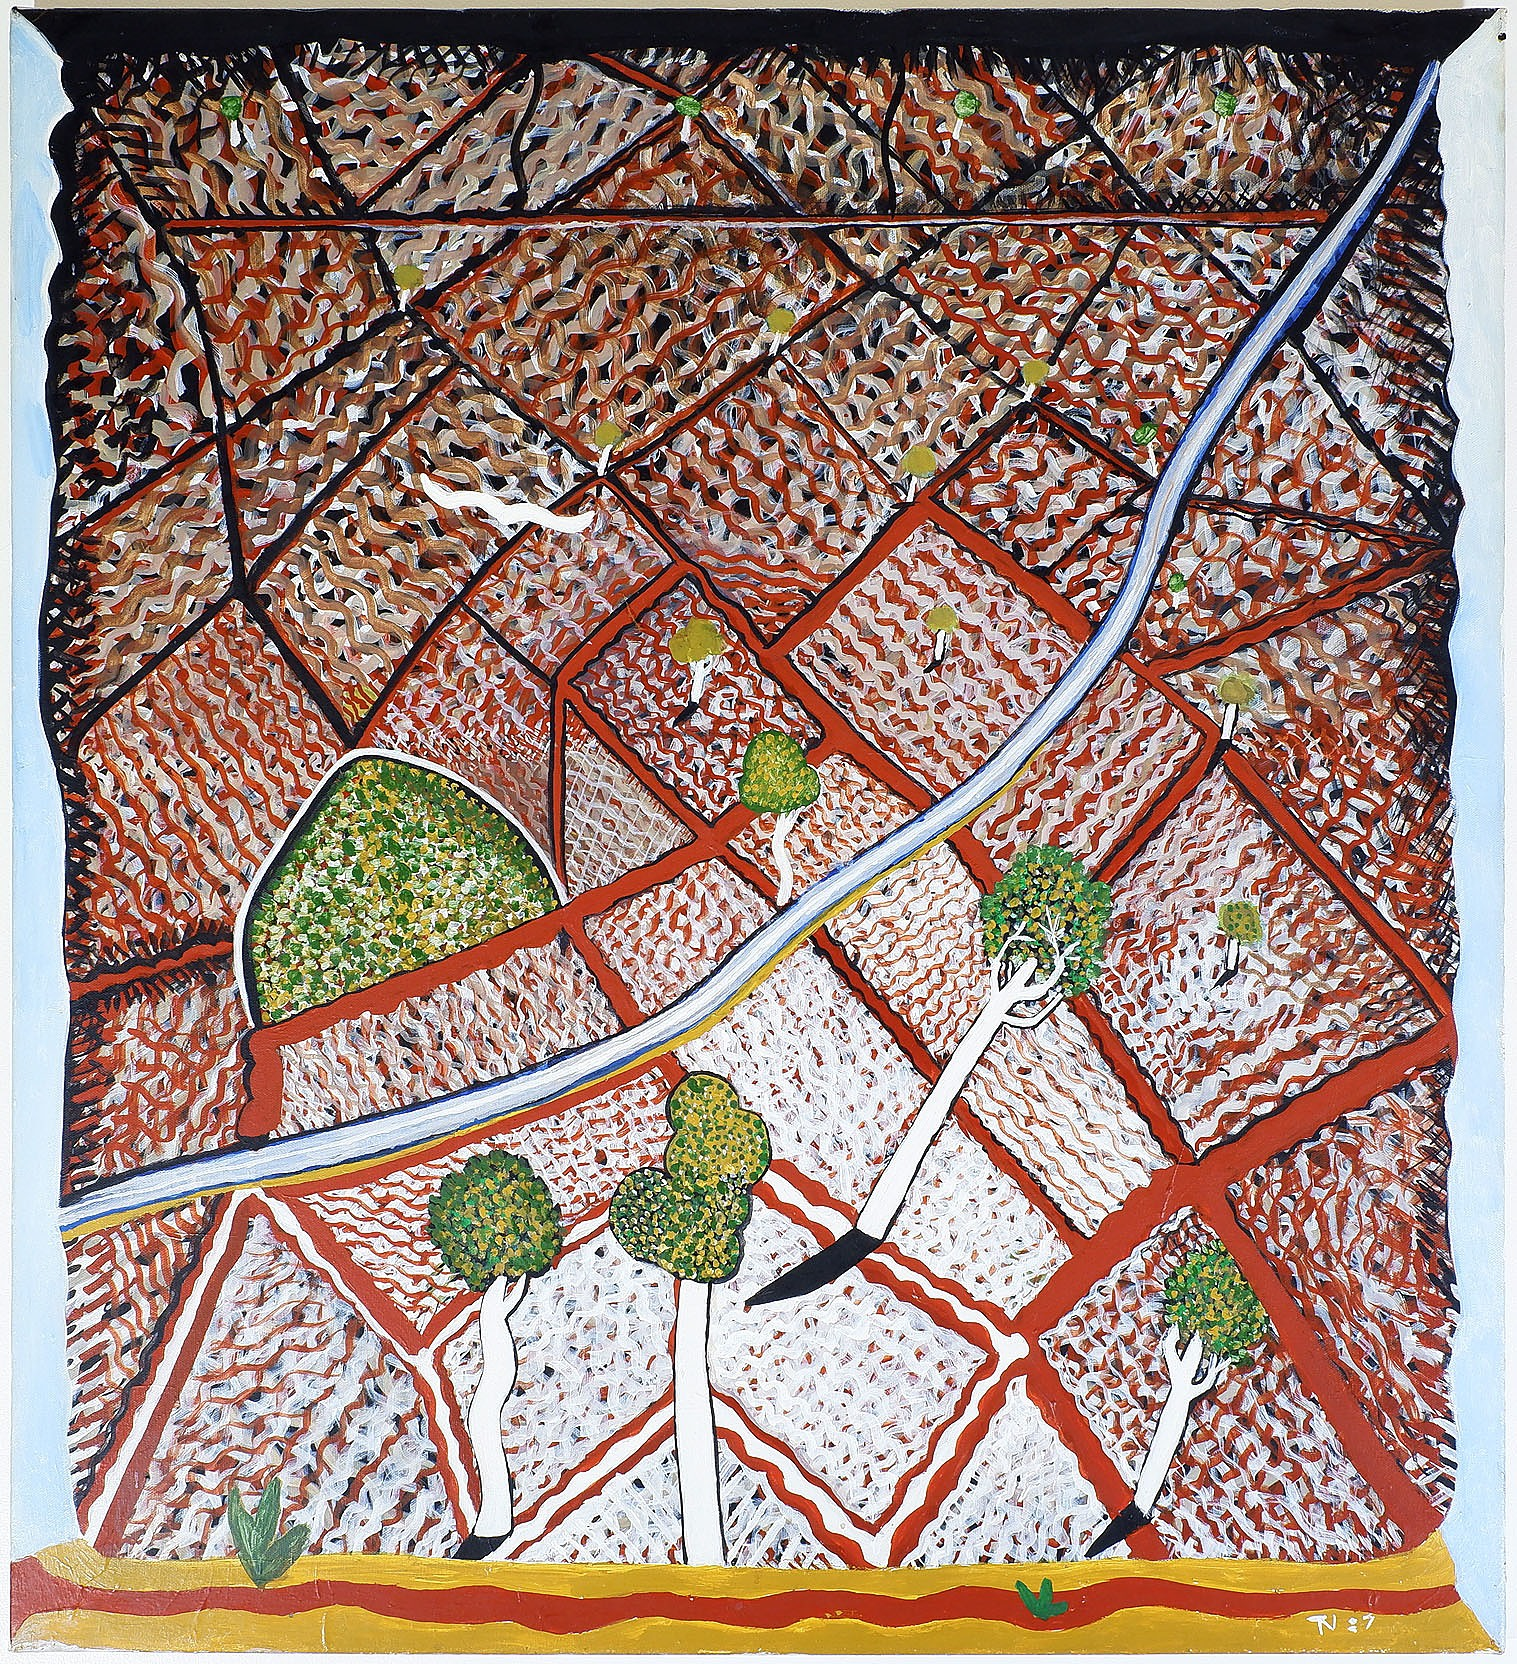 'Trevor Nickolls (1949-2012) The River, Acrylic on Canvas'